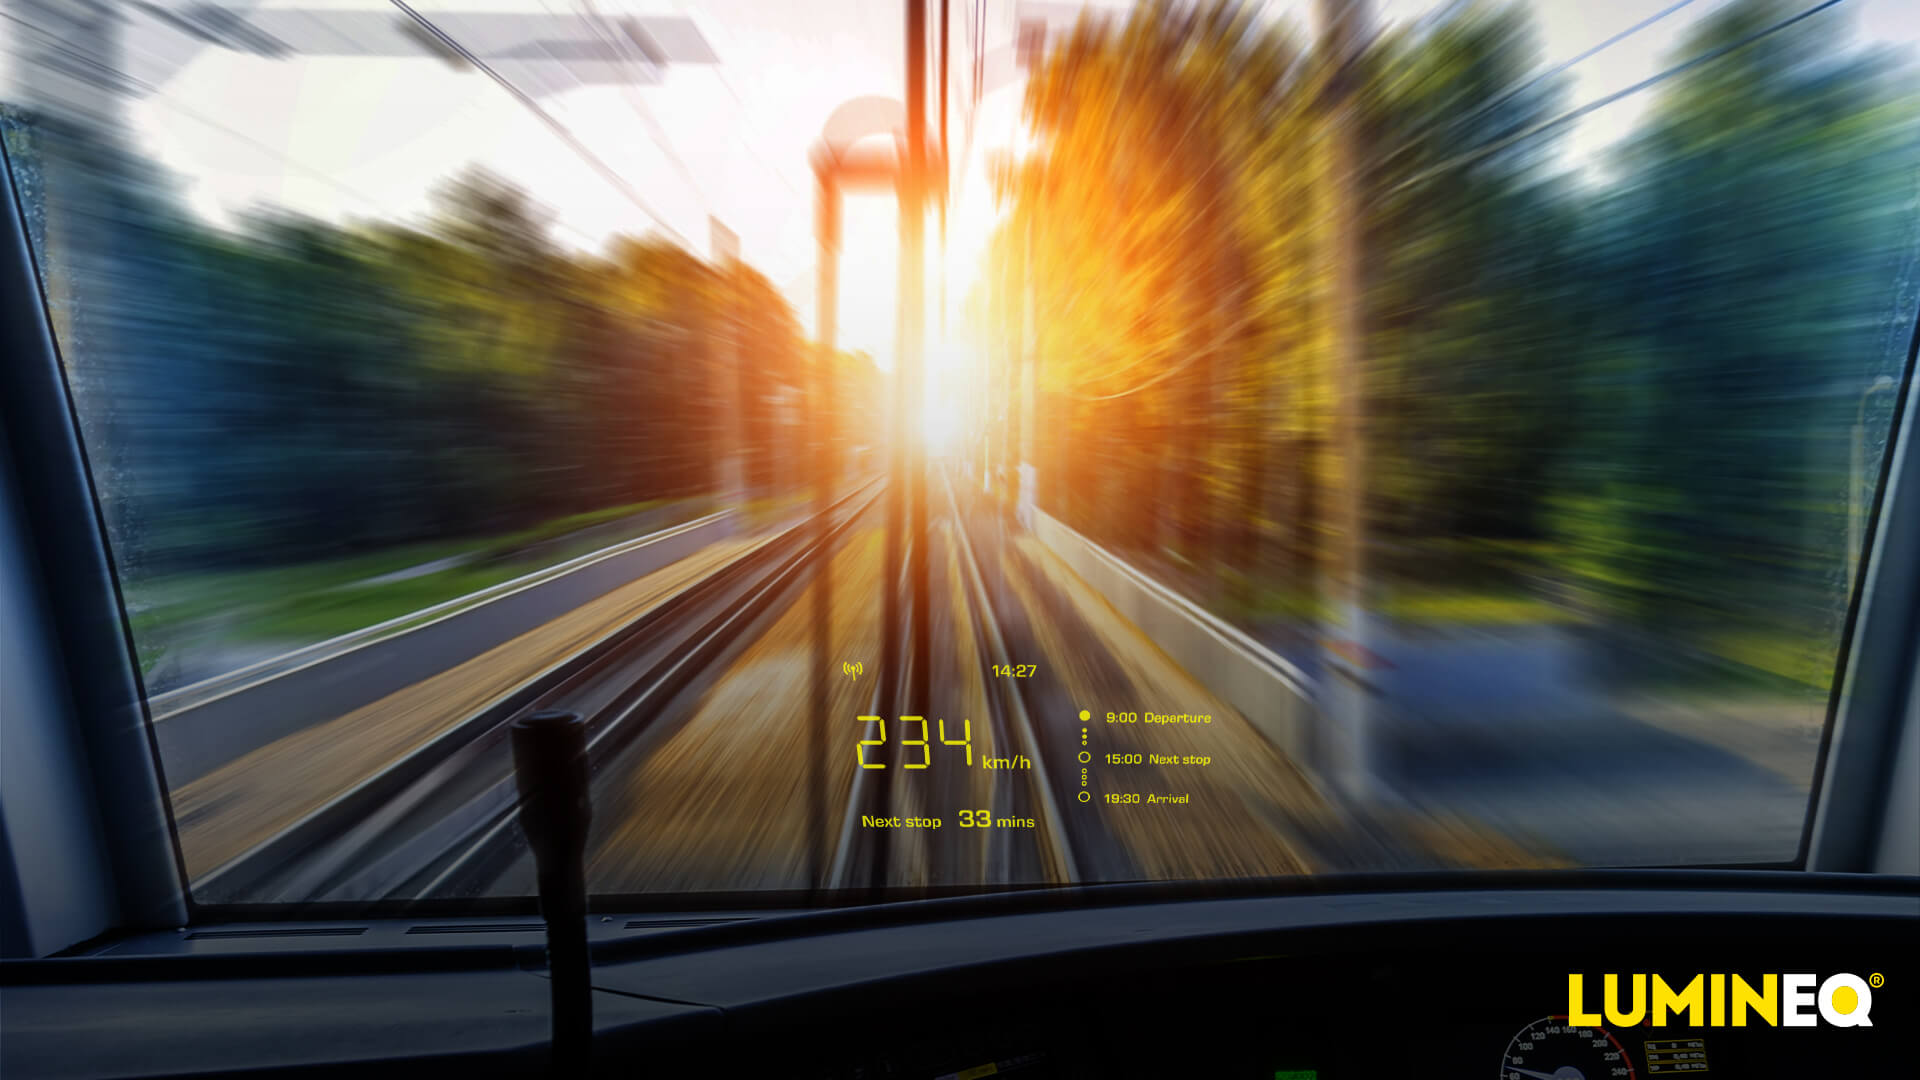 Train_Cabin_HUD-v02-2021-1920x1080_small